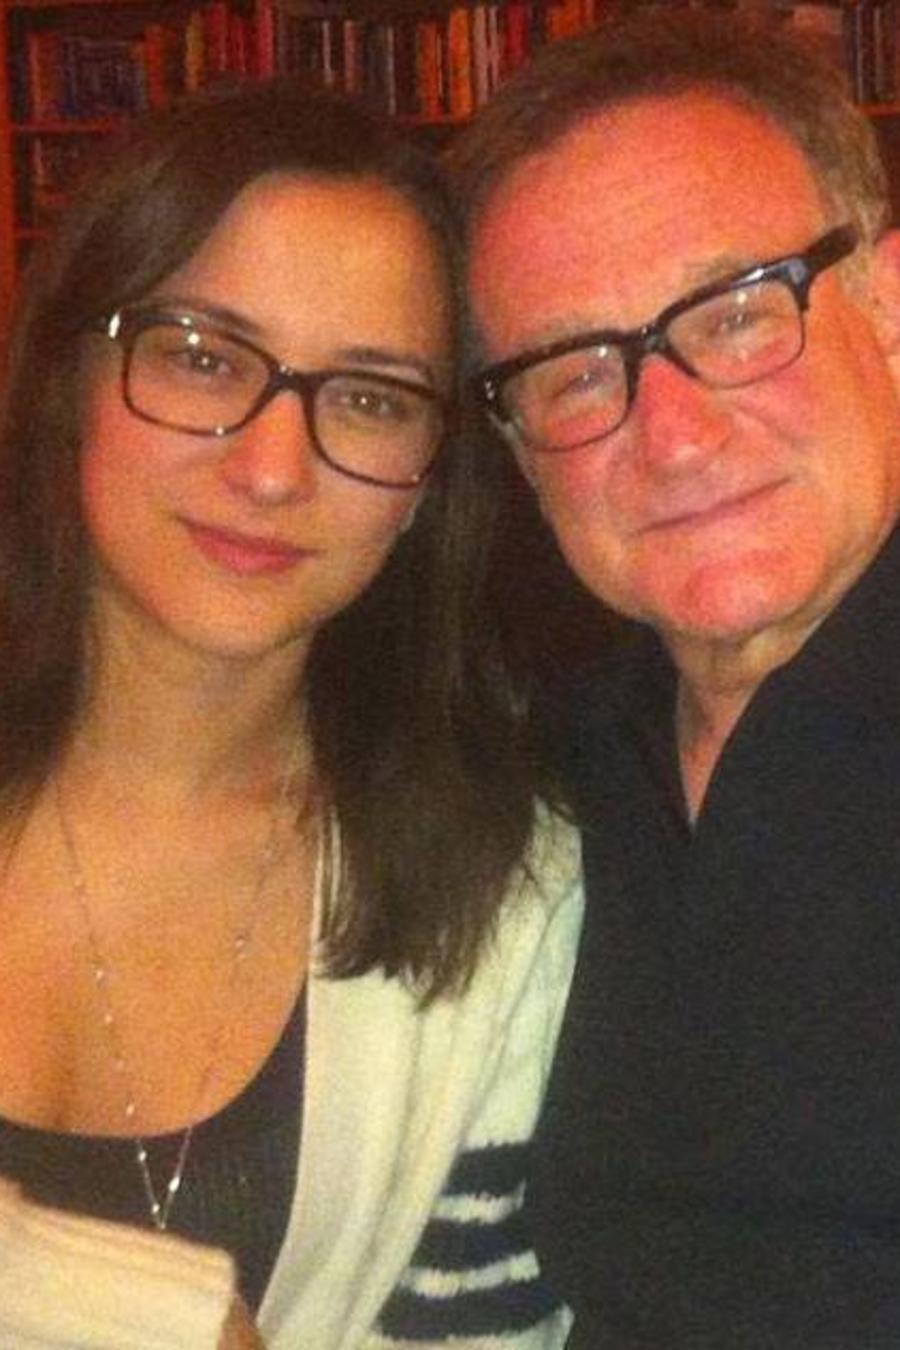 Zelda Williams with her dad Robin Williams